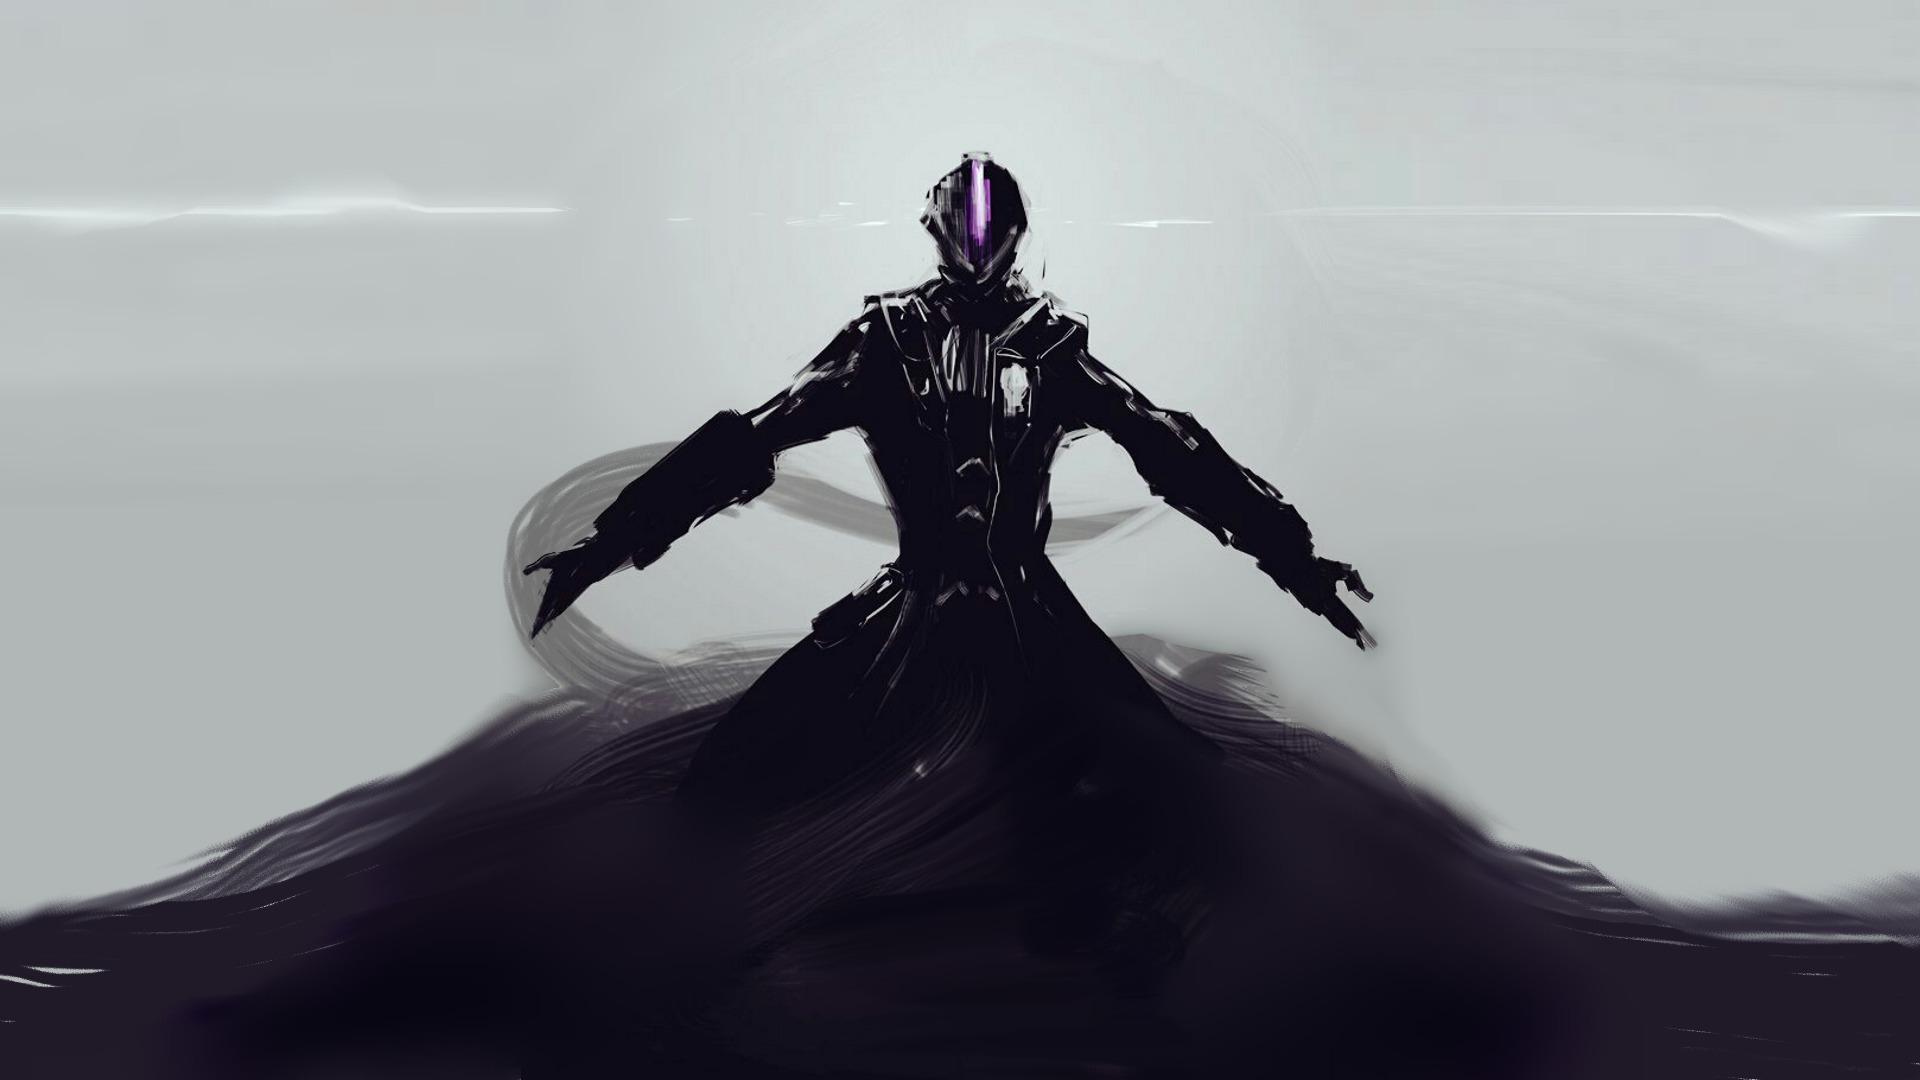 Dark Anime Creature Figure Art, Full HD Wallpaper